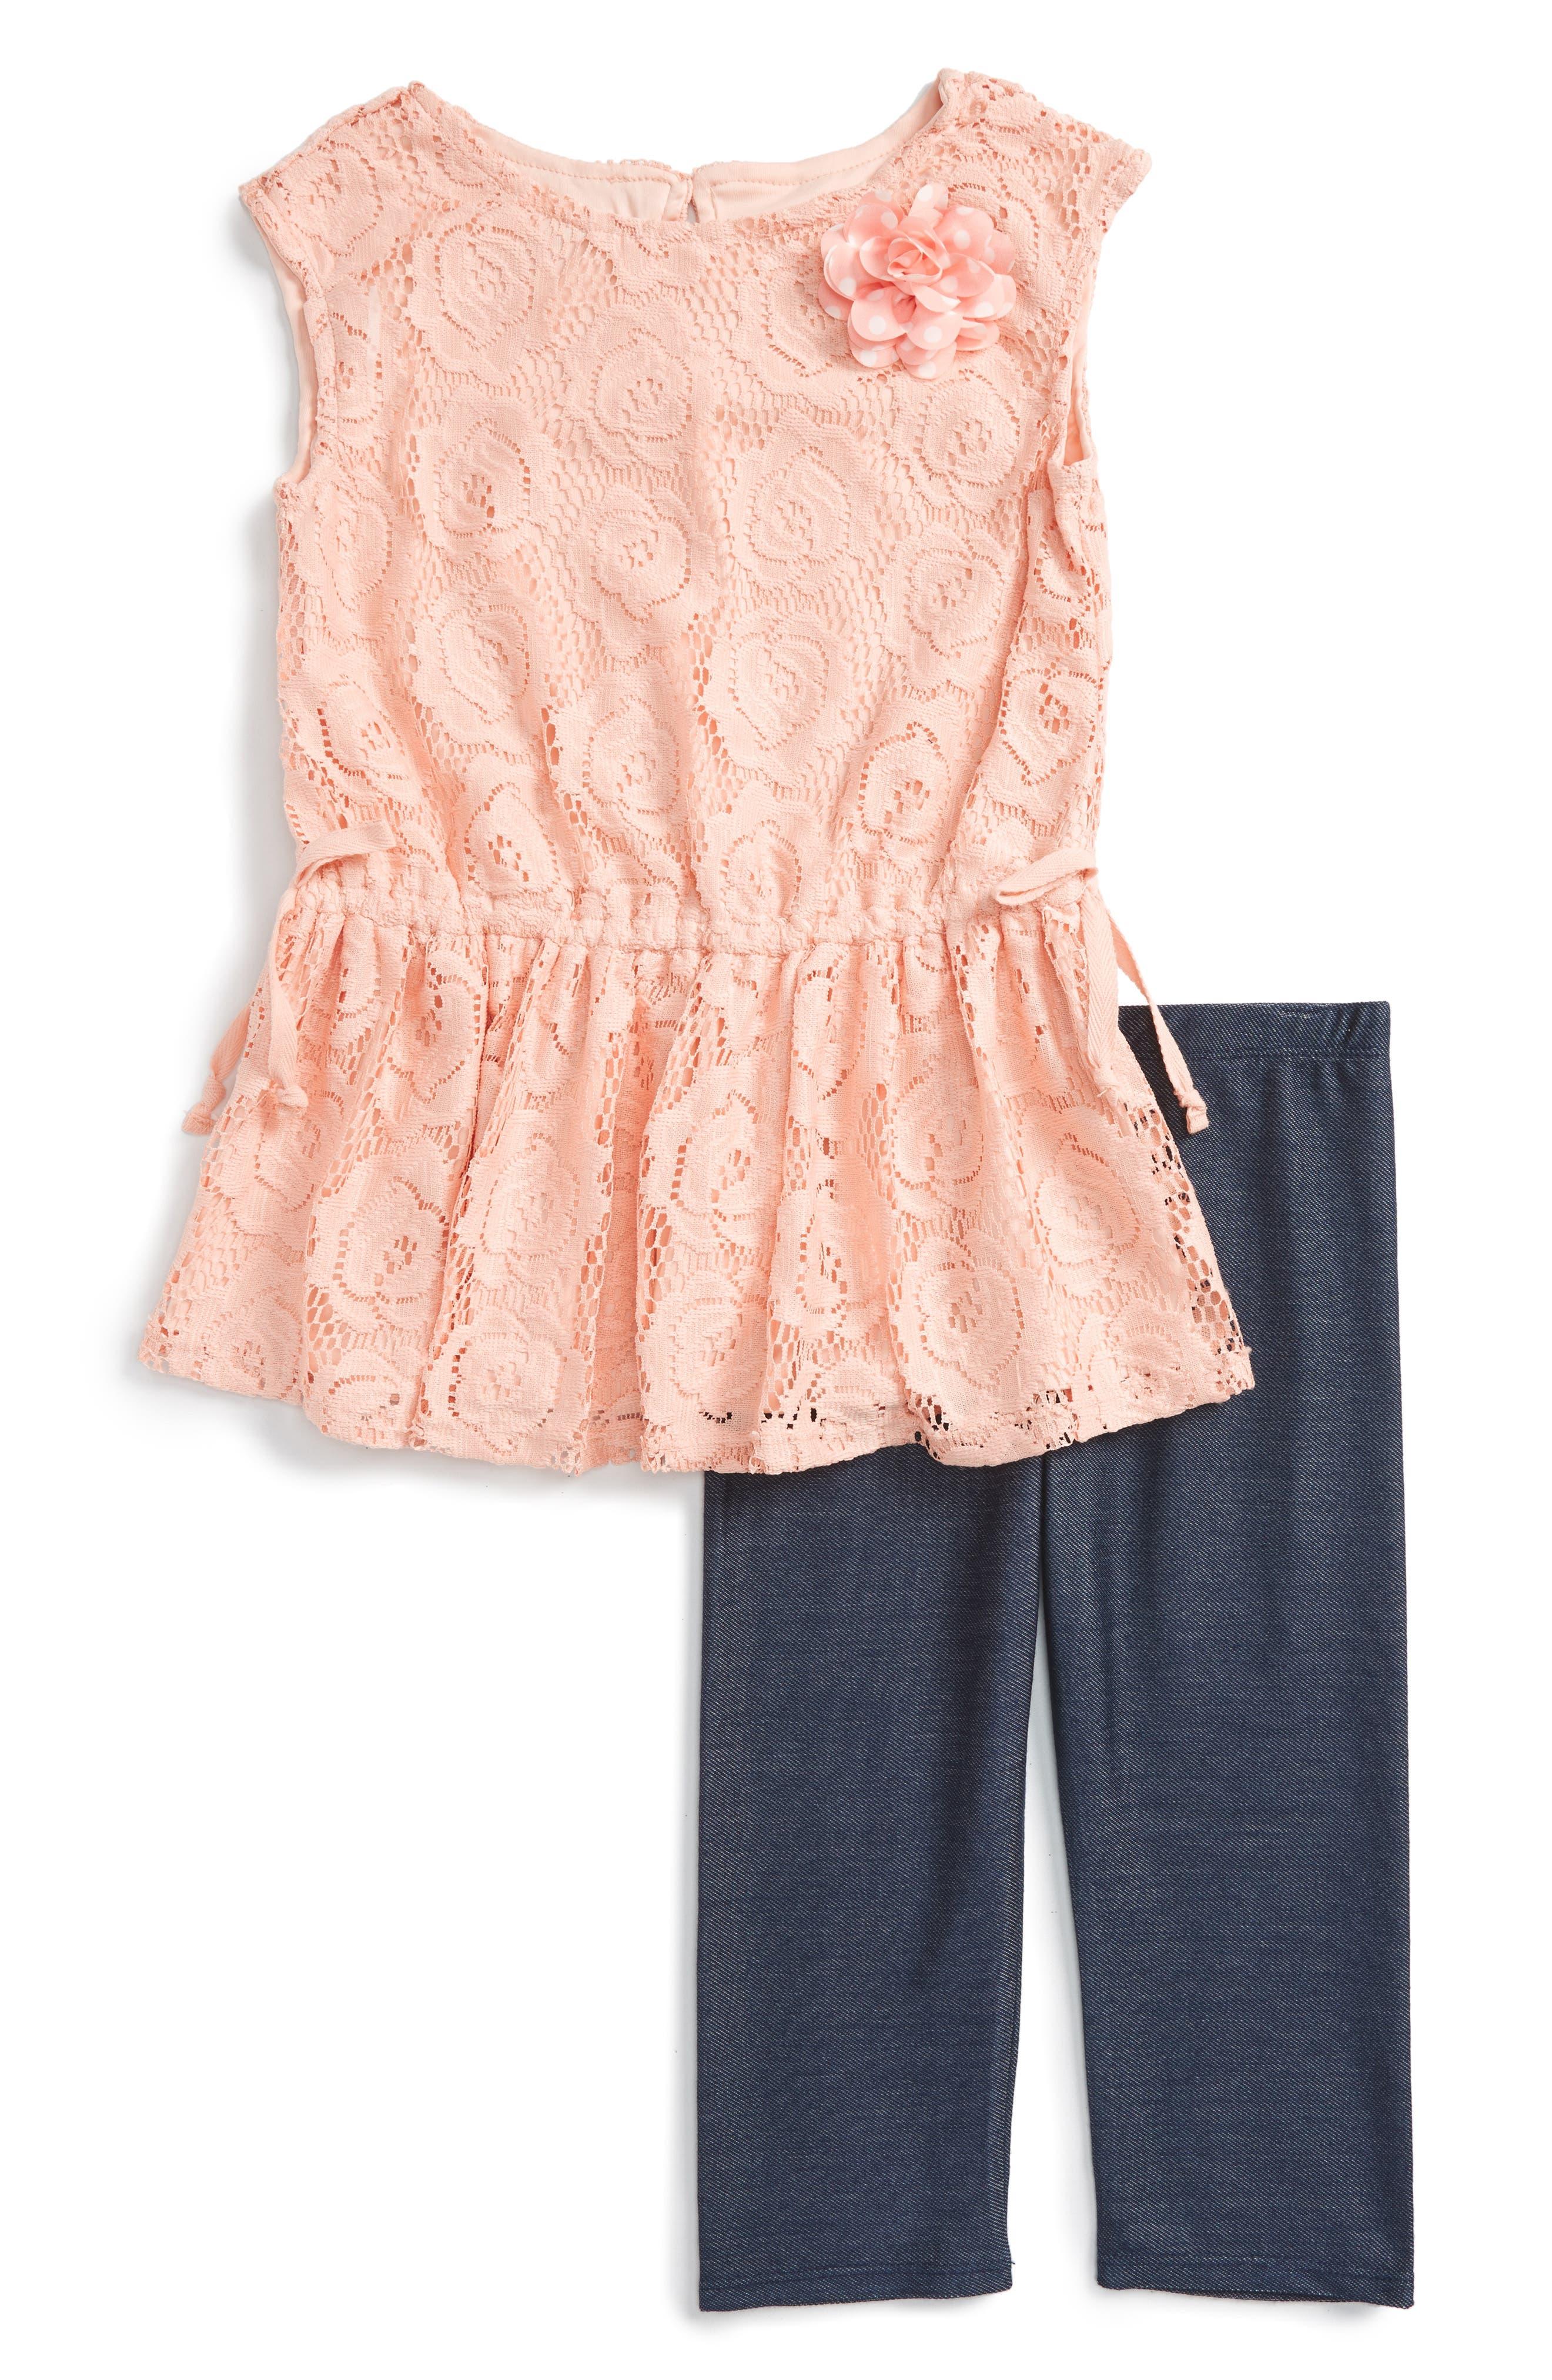 Alternate Image 1 Selected - Pippa & Julie Lace Tunic & Leggings Set (Toddler Girls & Little Girls)